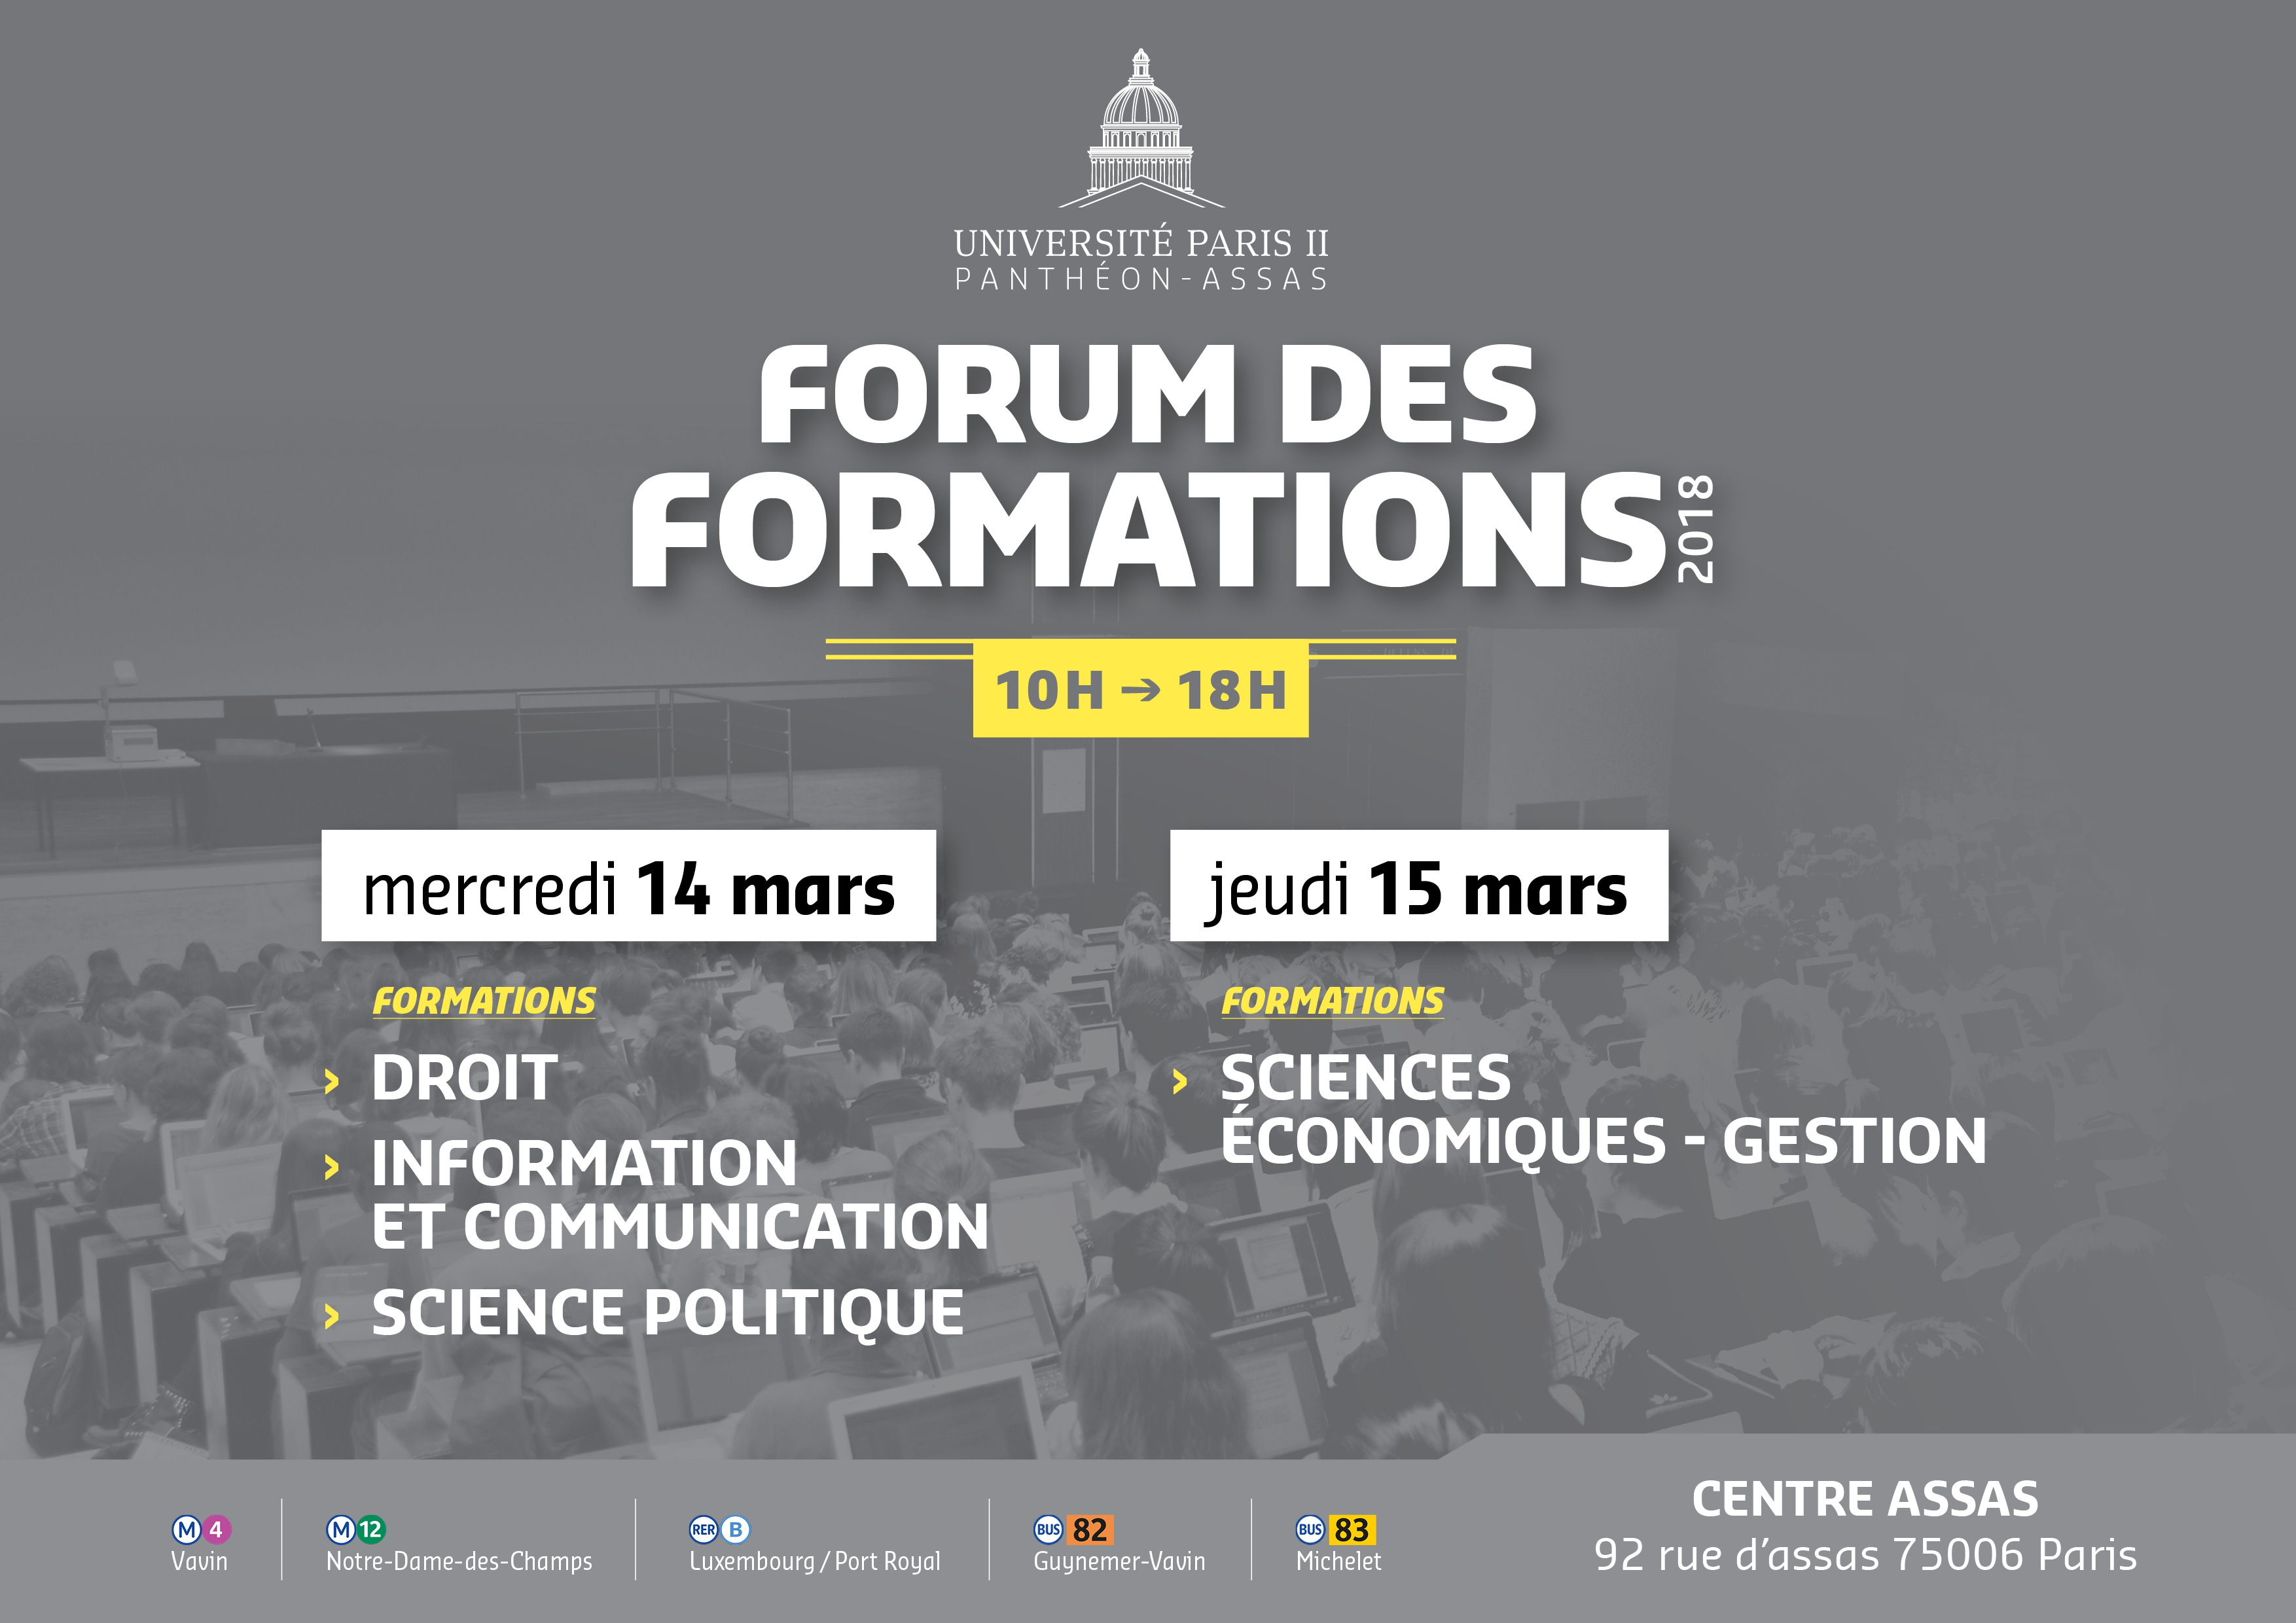 Forum des formations 2018